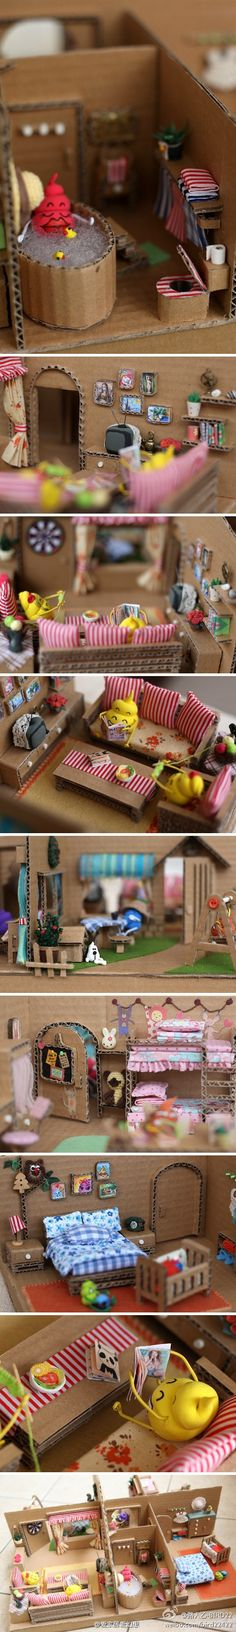 Little dream house ~ LOVE!!!